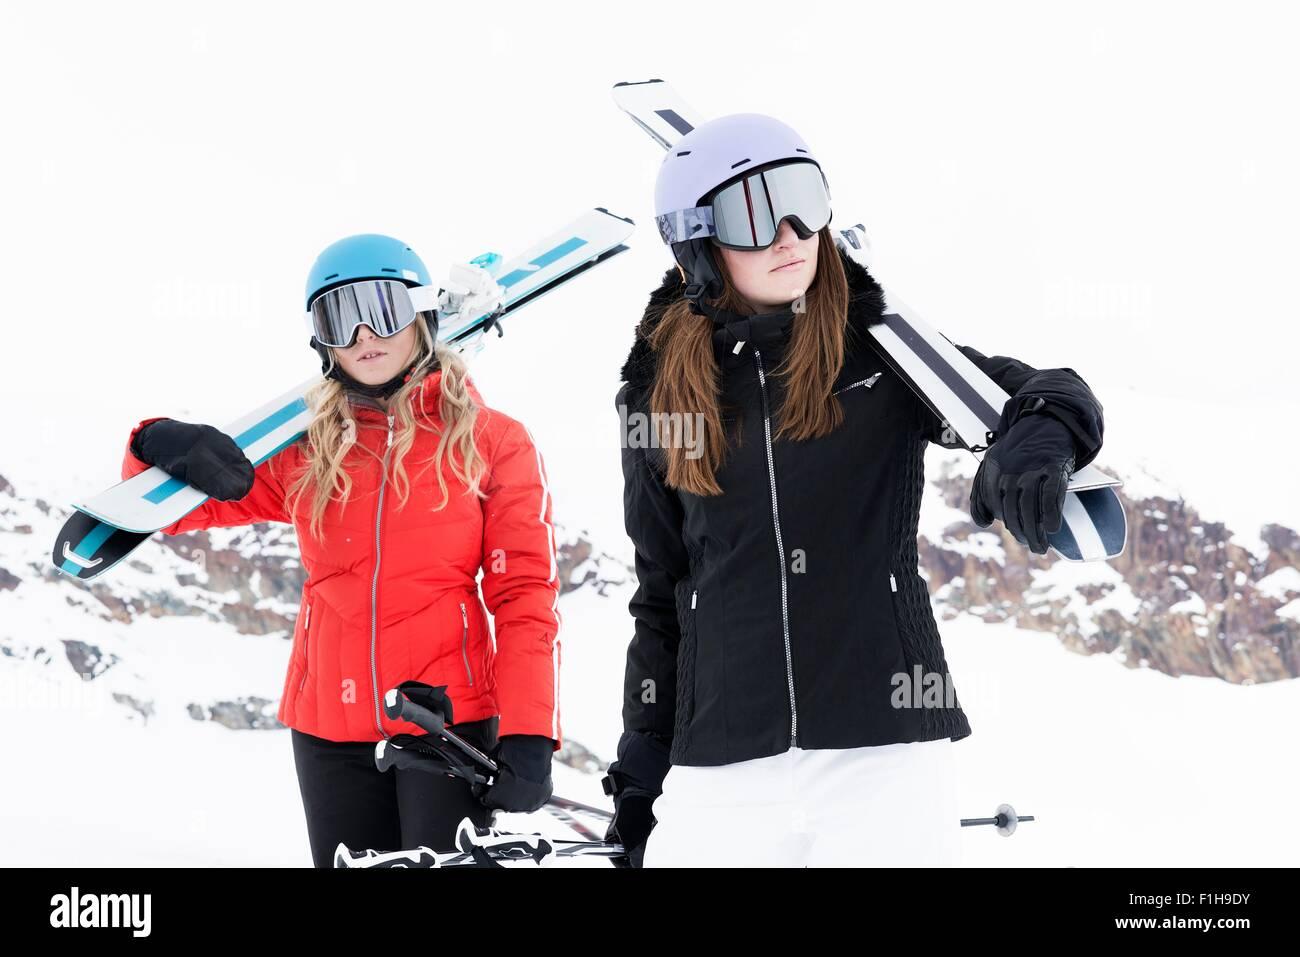 87ea032f373 Women wearing helmets and ski goggles holding skis